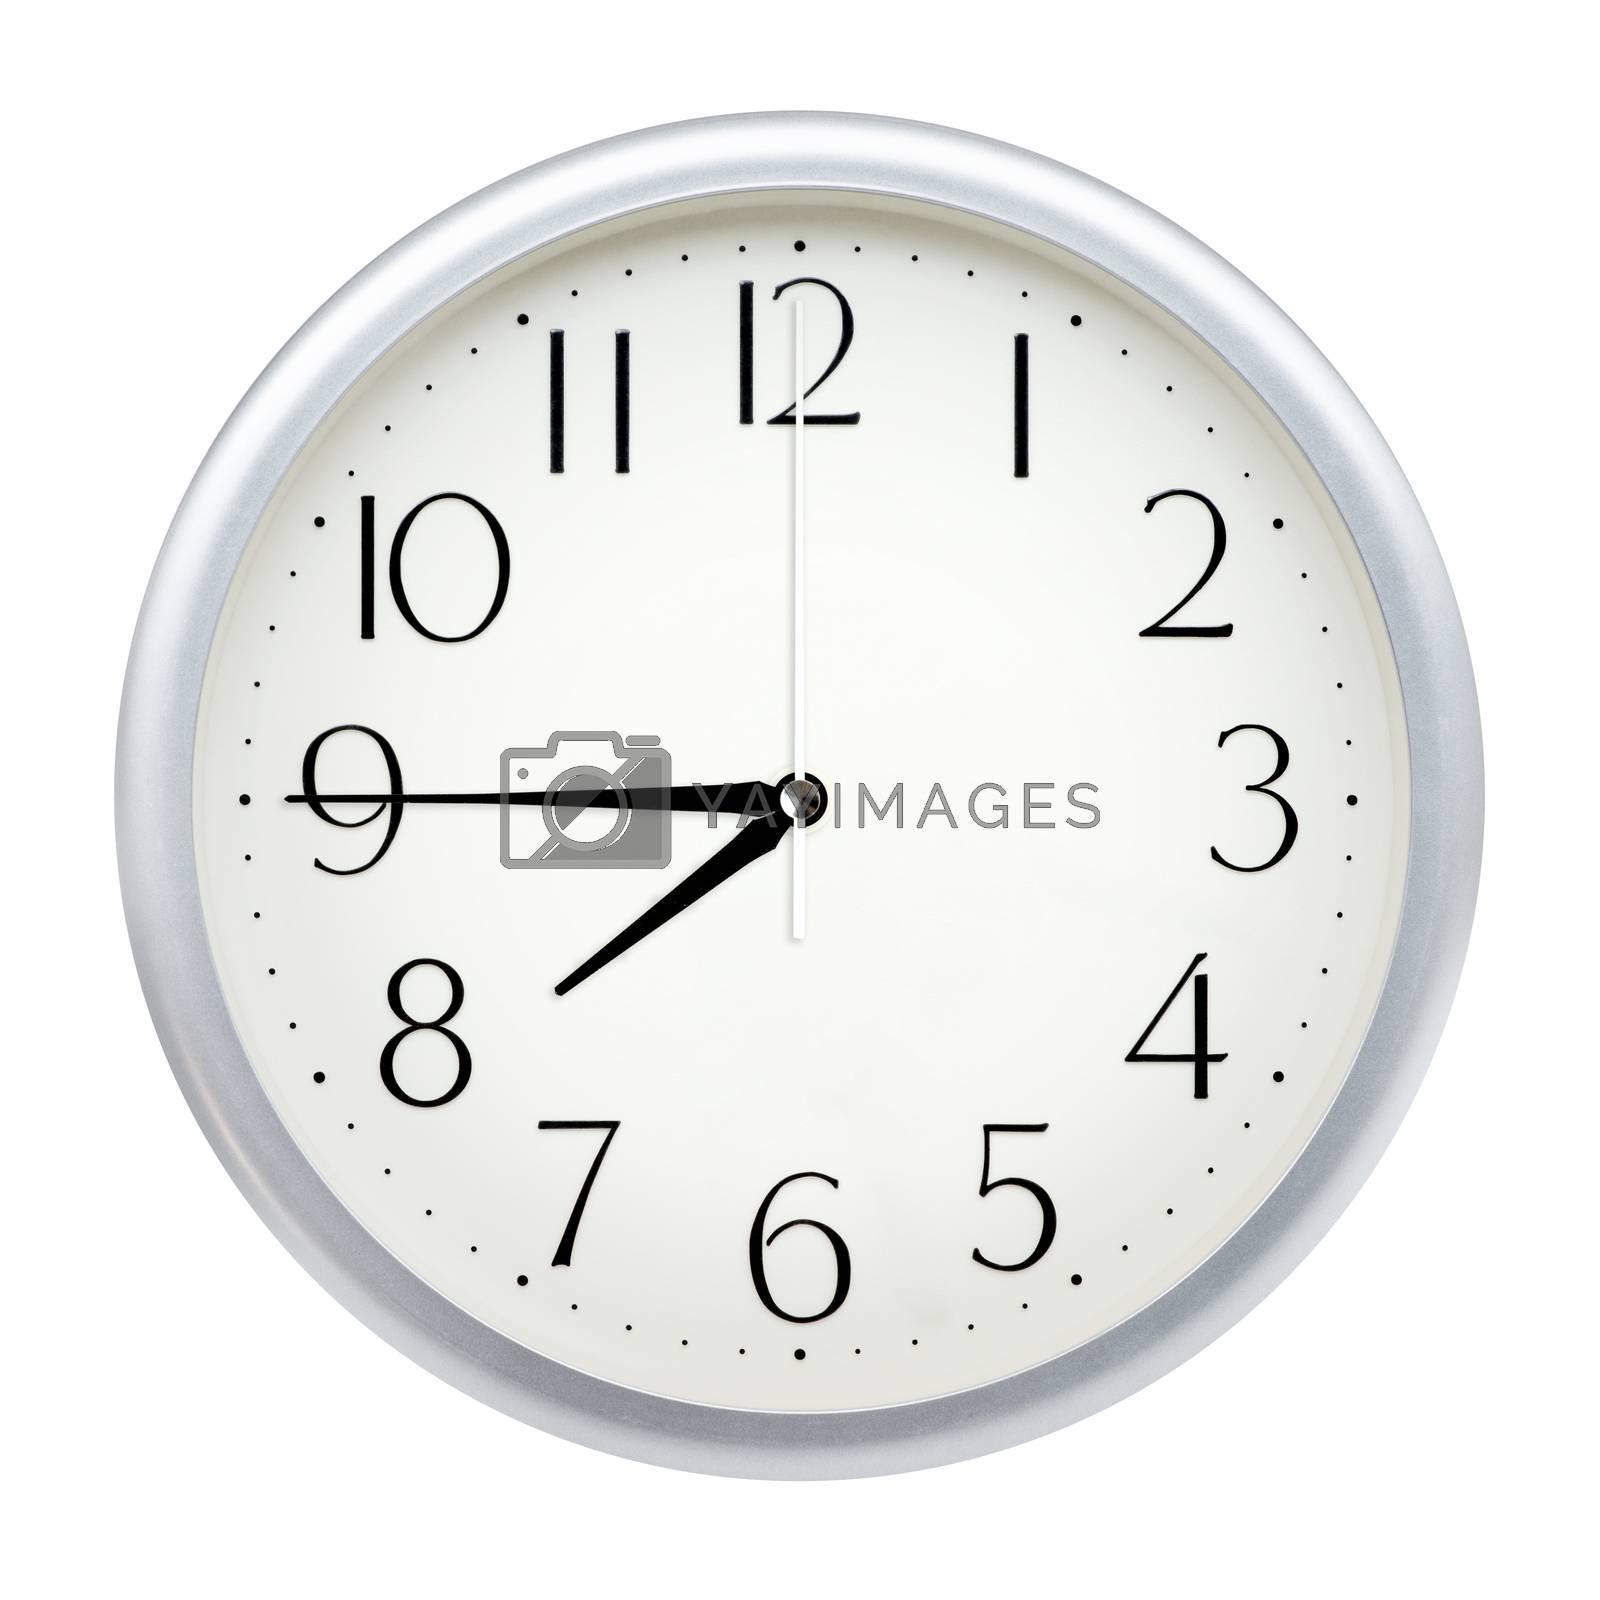 Analog wall clock isolated on white background.